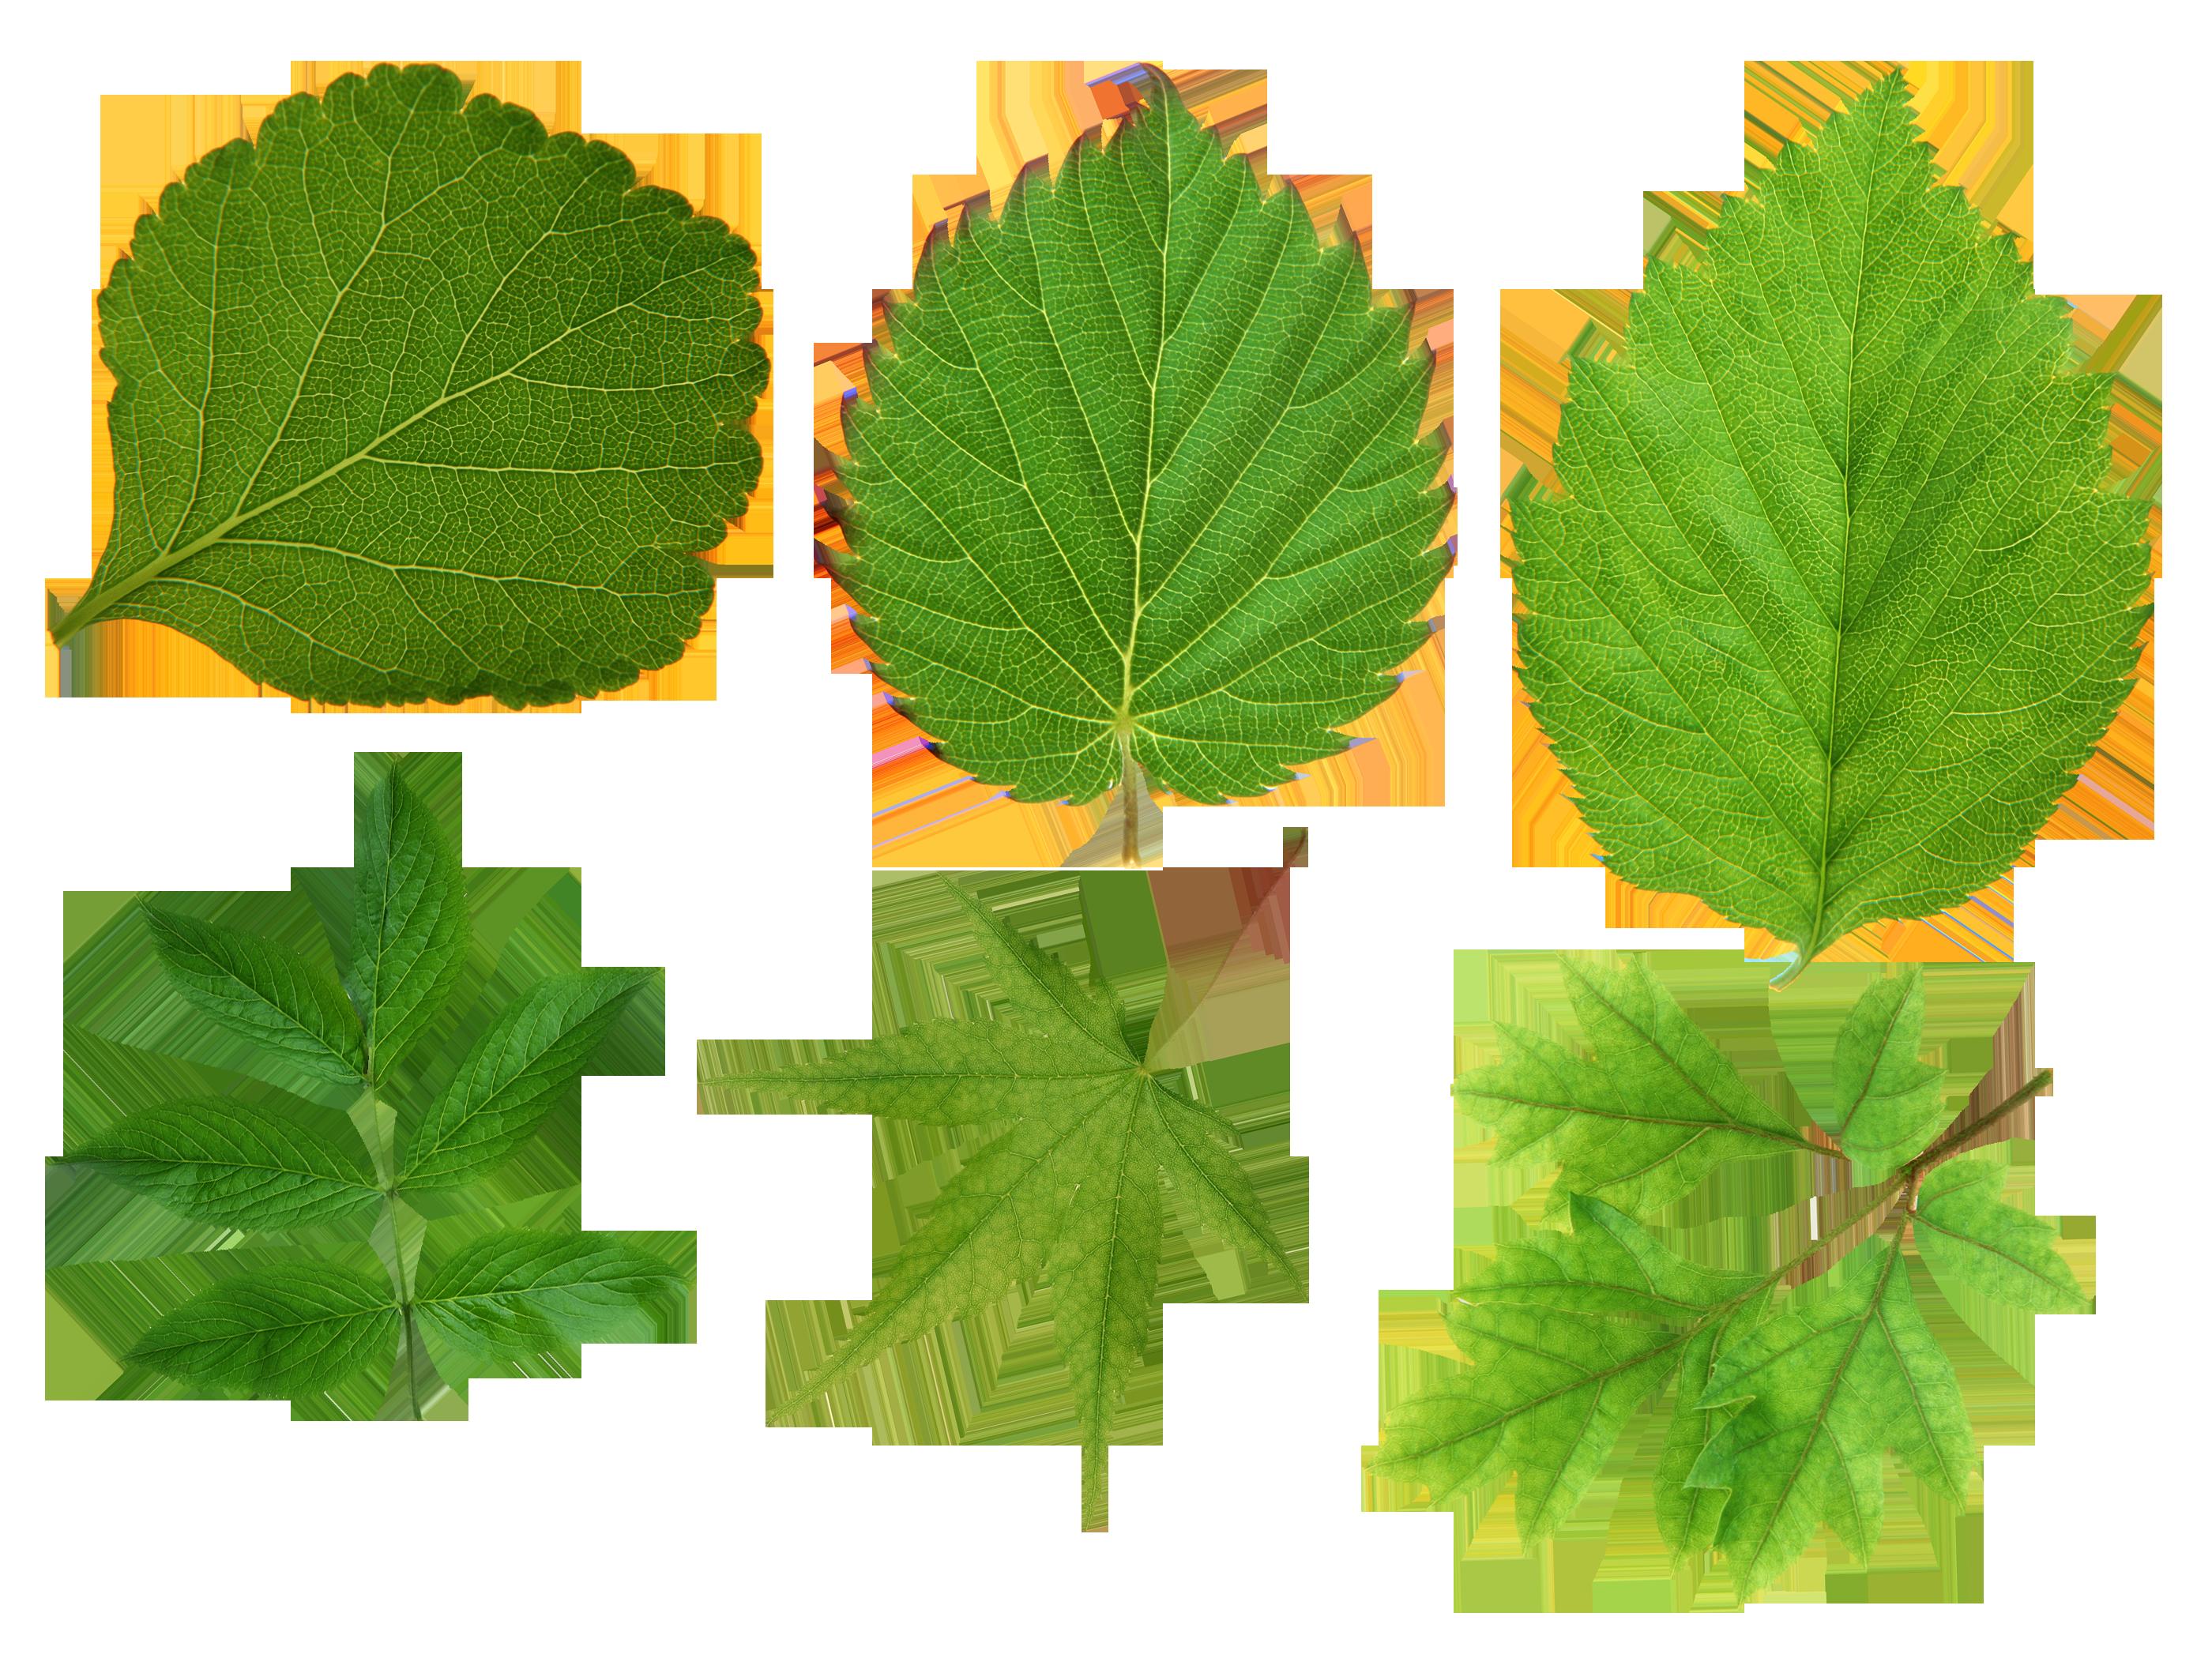 Green Leaves Png Image Green Leaves Leaves Green Leaf Background